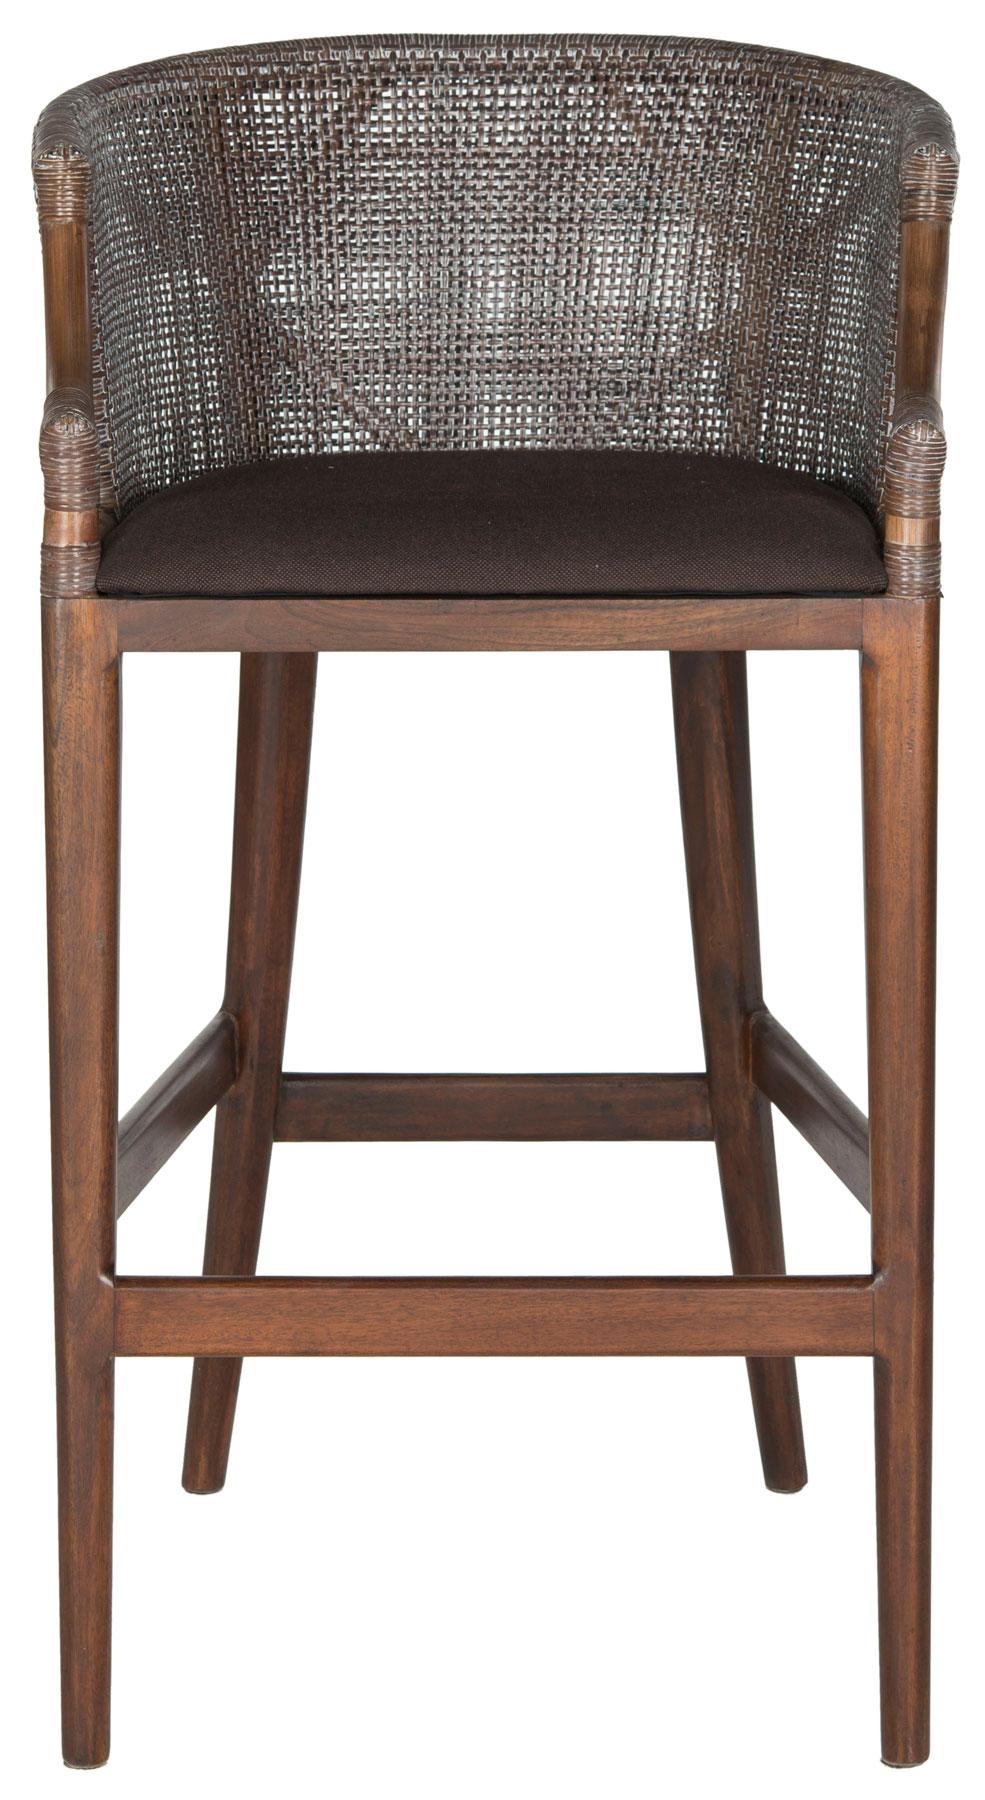 sea4014a bar stools furniture by safavieh